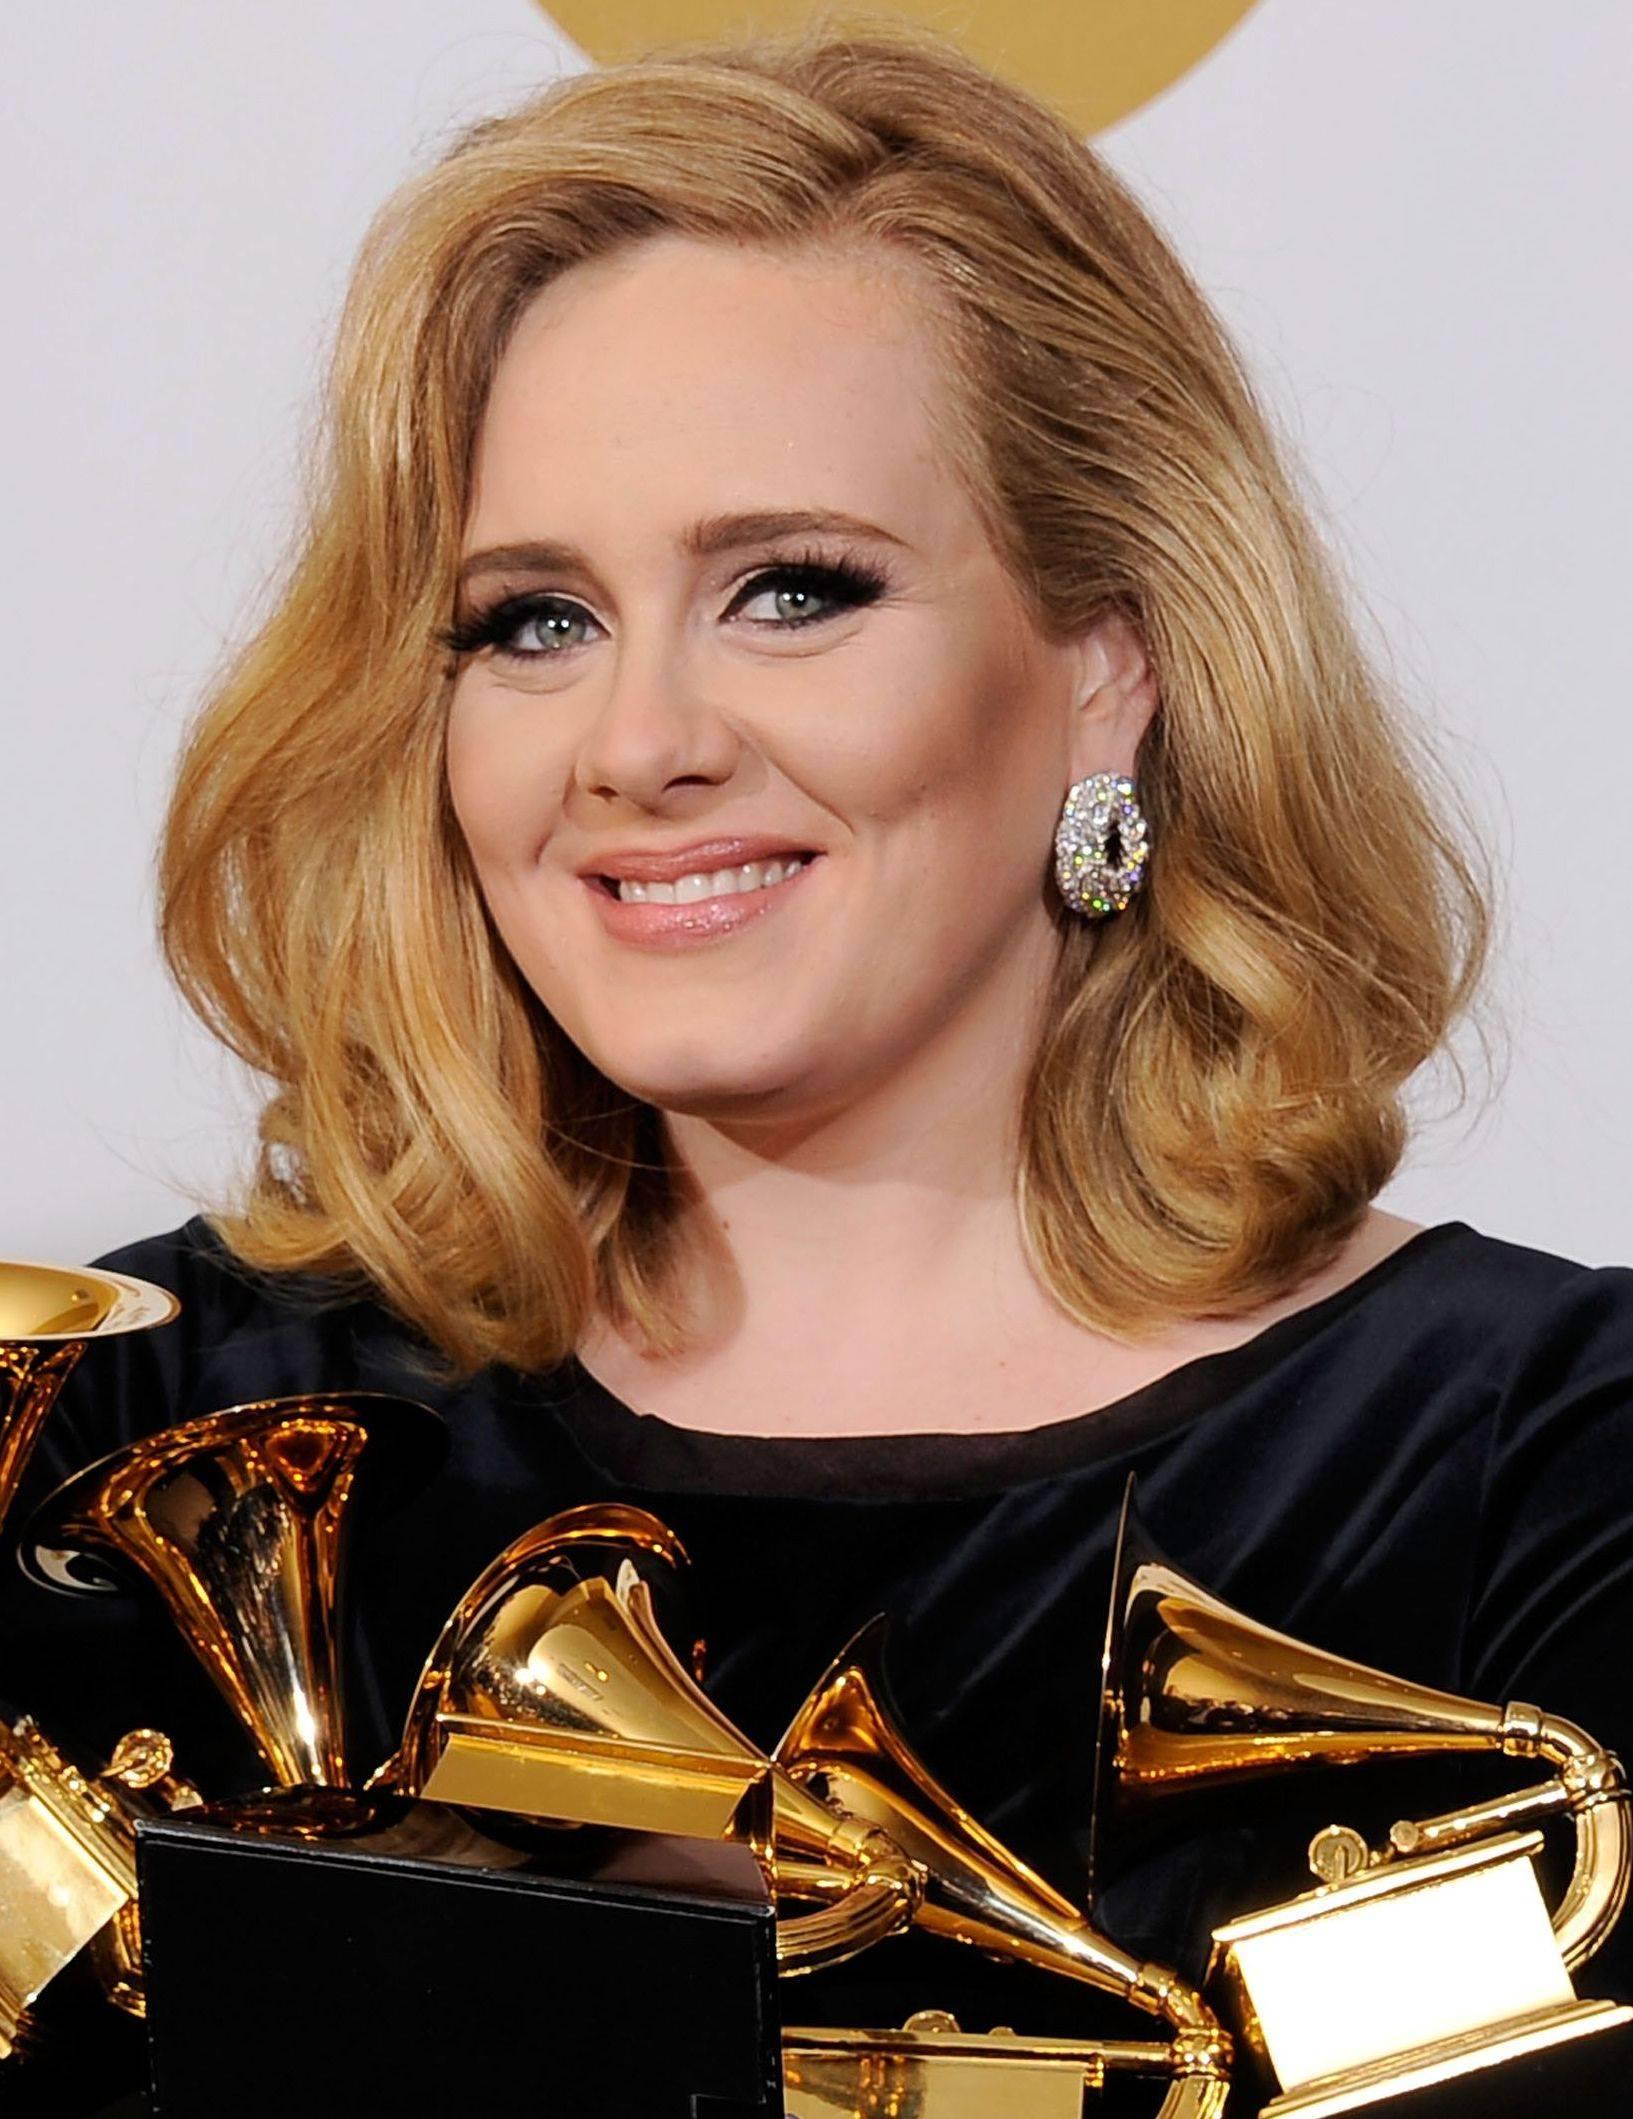 Foto de Adele  número 34531